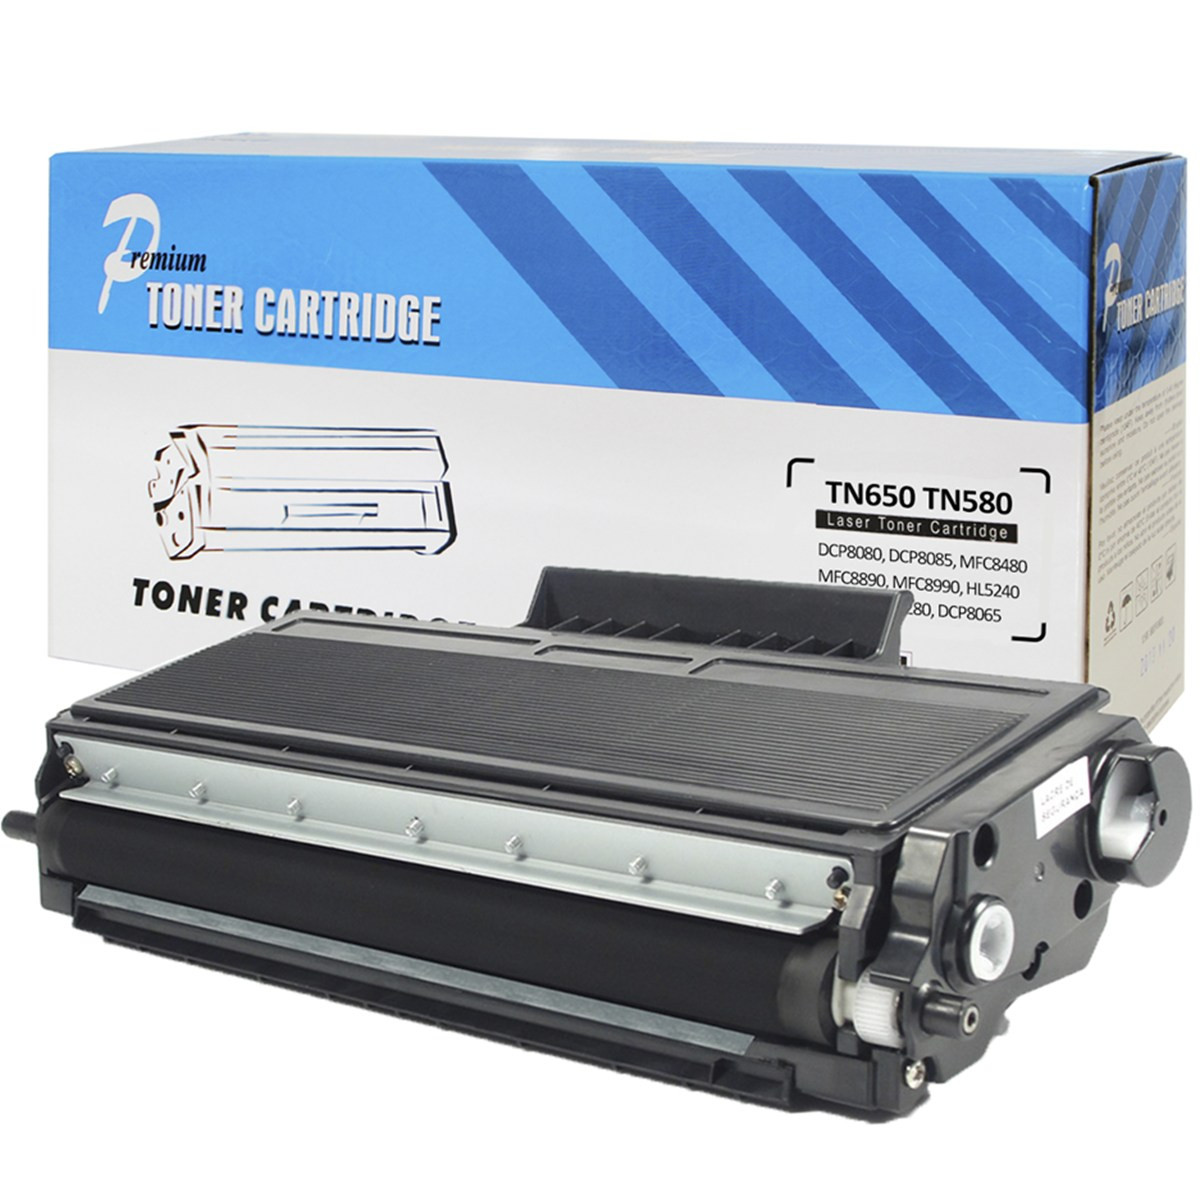 TONER COMPATIVEL BROTHER TN580/8060/65/70/80/85 (7K)